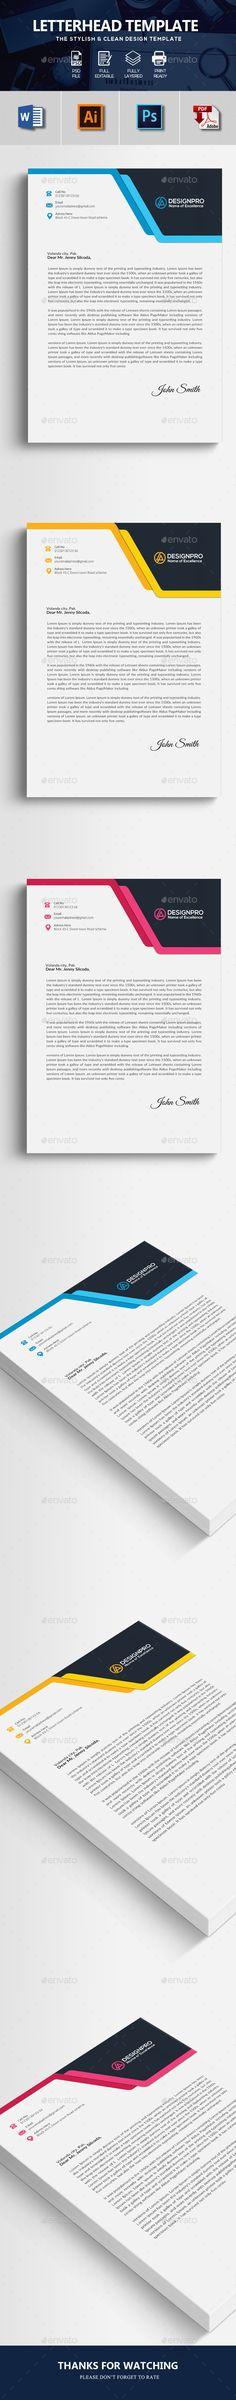 letterhead business letter format envelope sample psd template - professional letterhead format